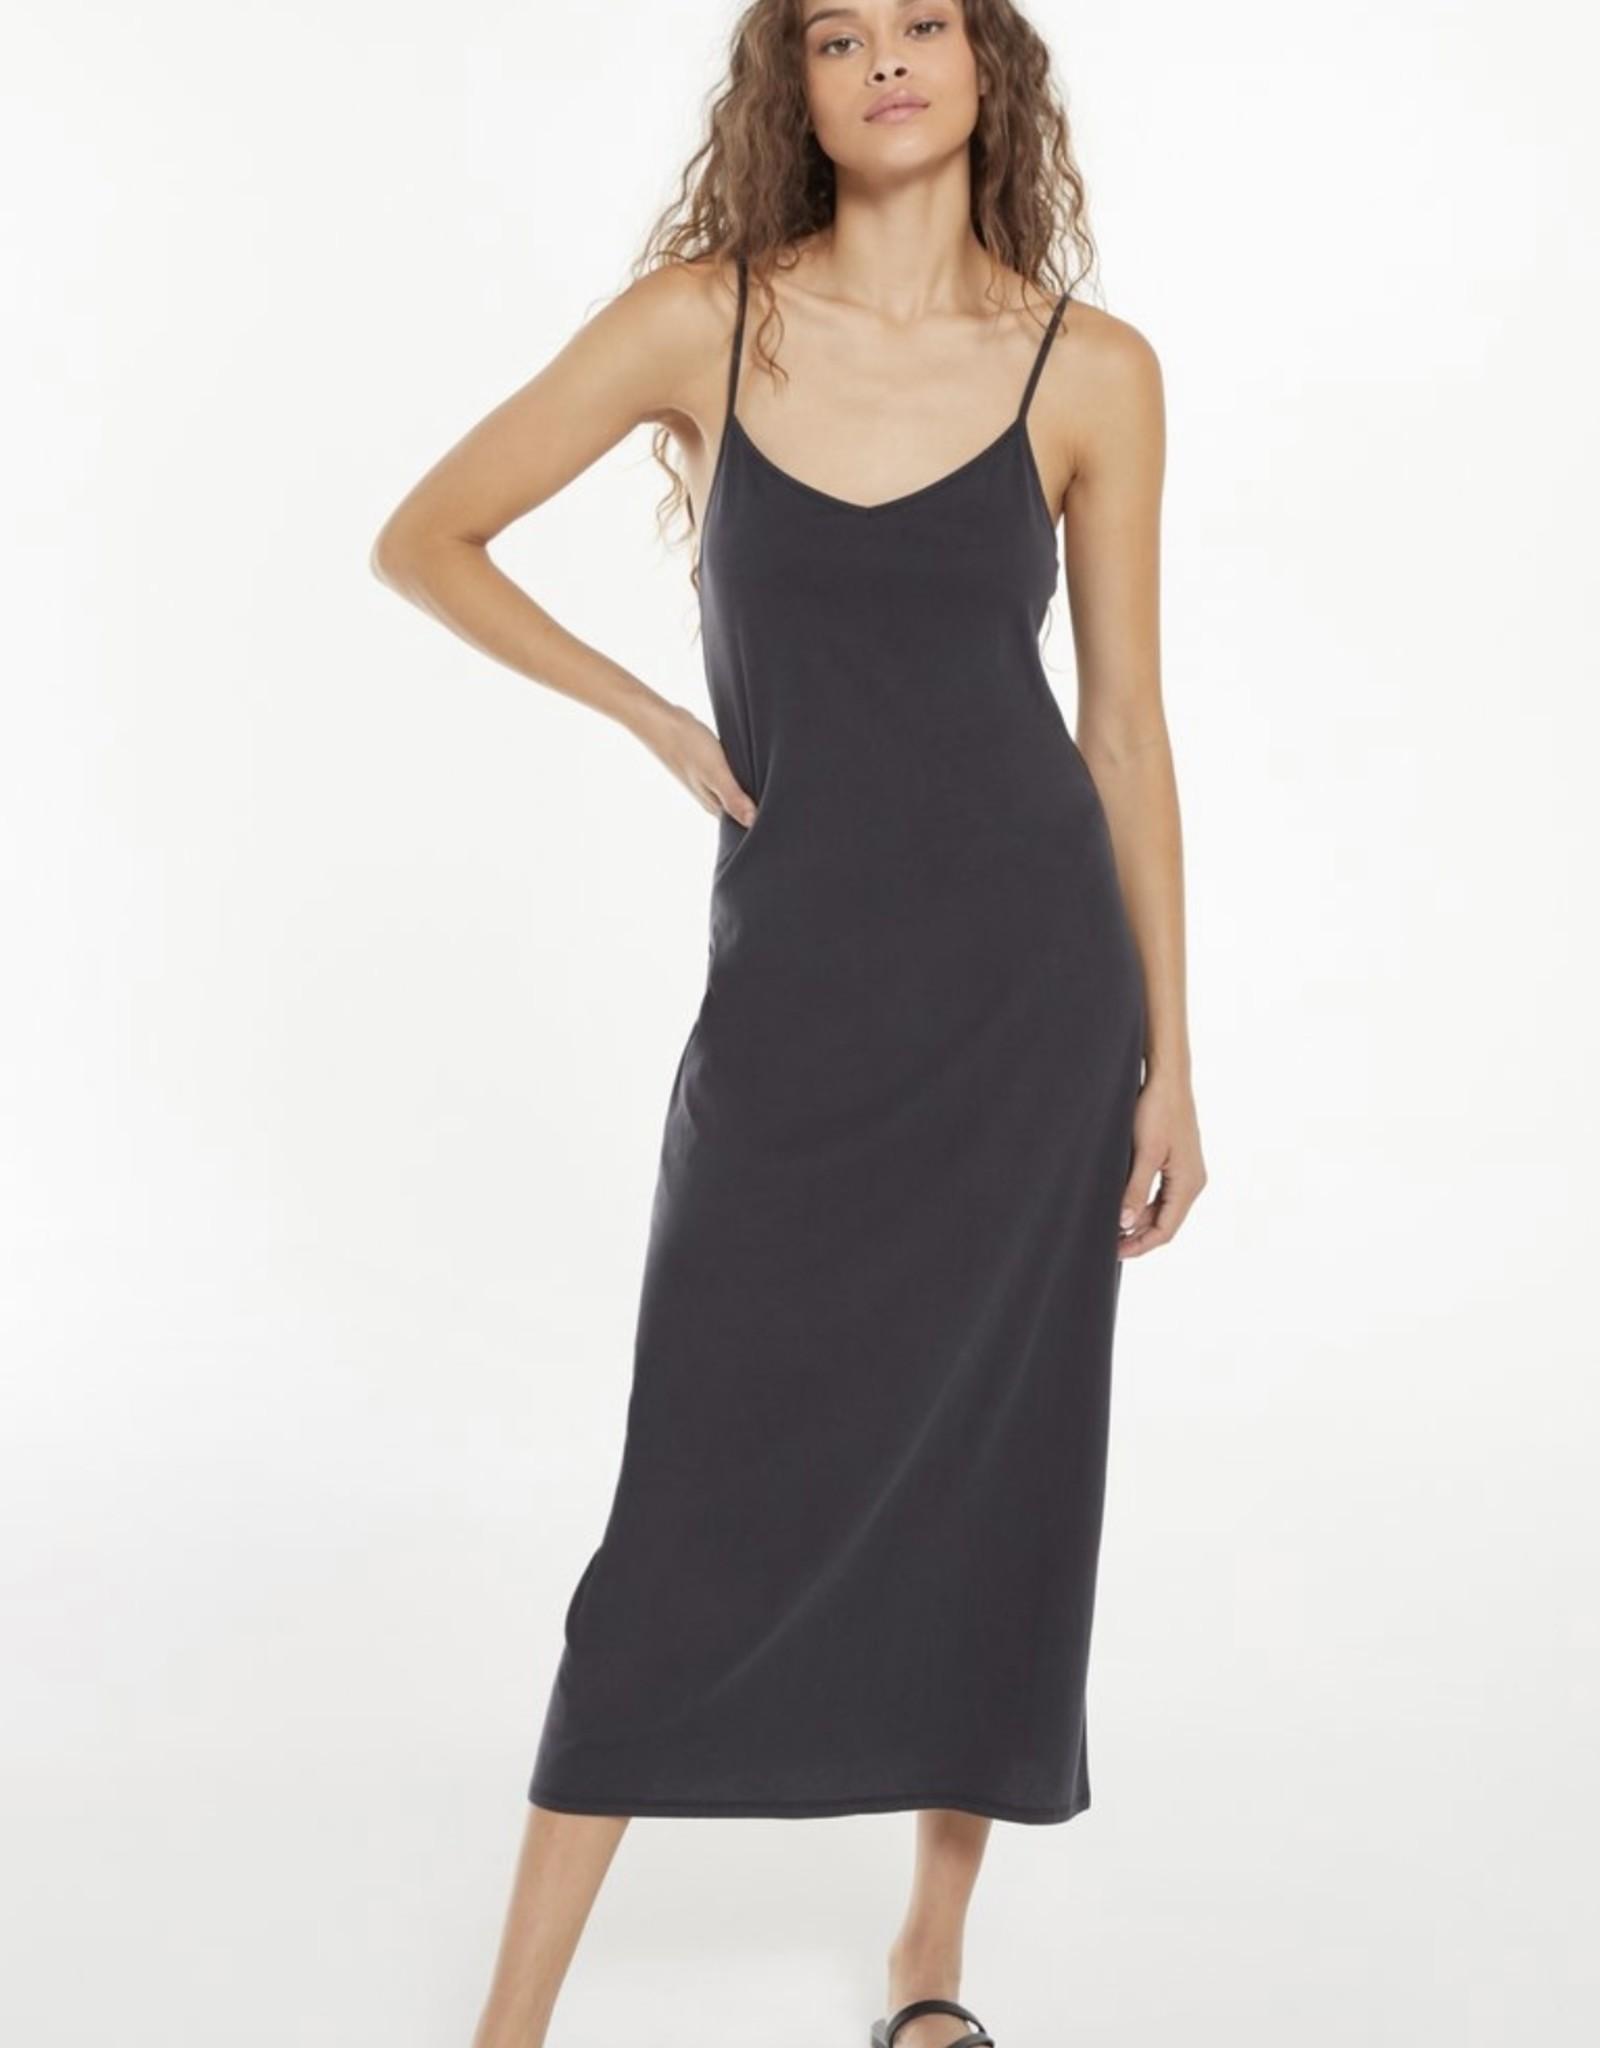 Z Supply Rayne Organic Slip Dress